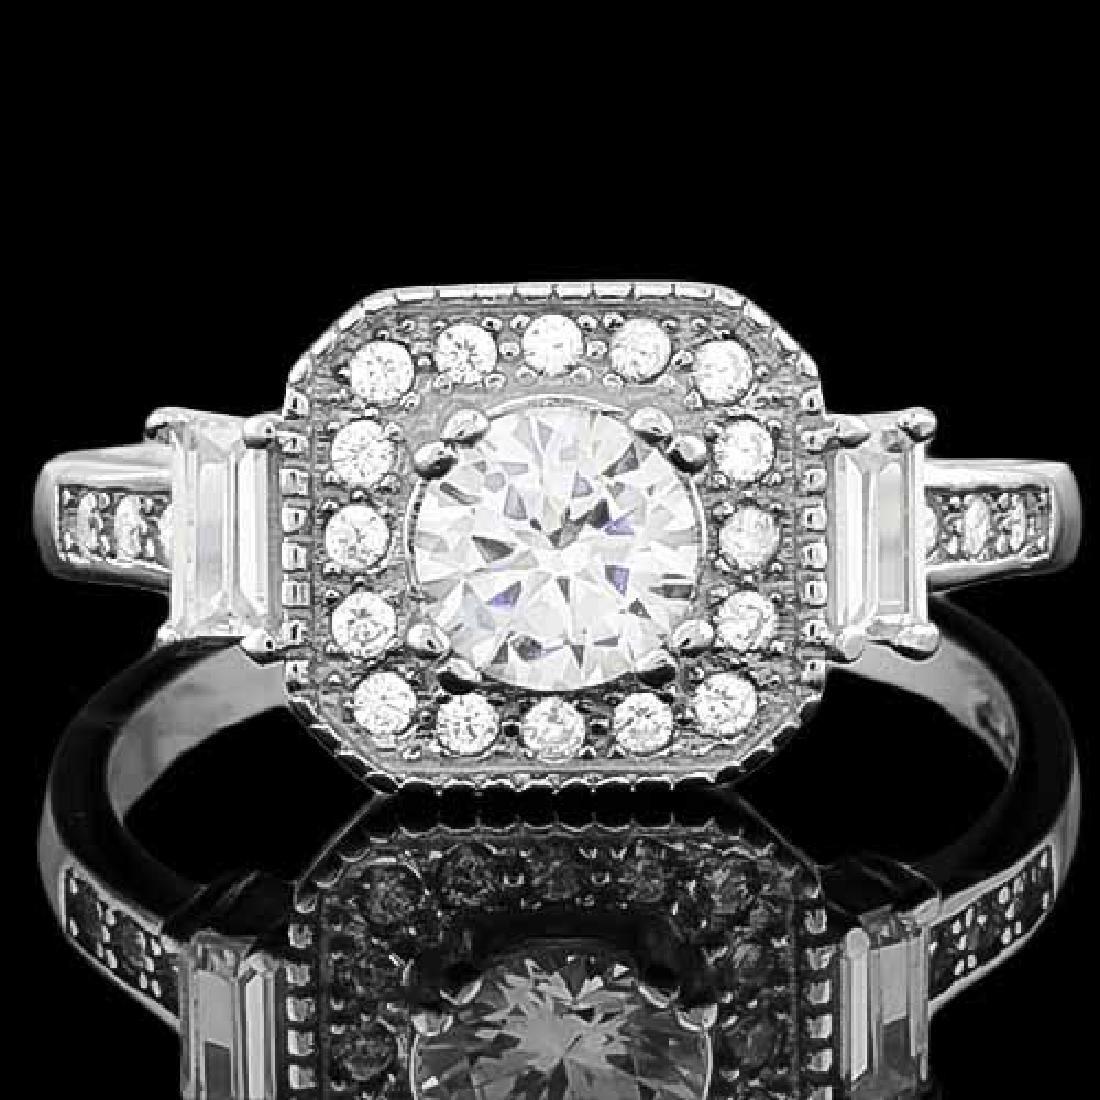 4/5 CARAT (26 PCS) FLAWLESS CREATED DIAMOND 925 STERLIN